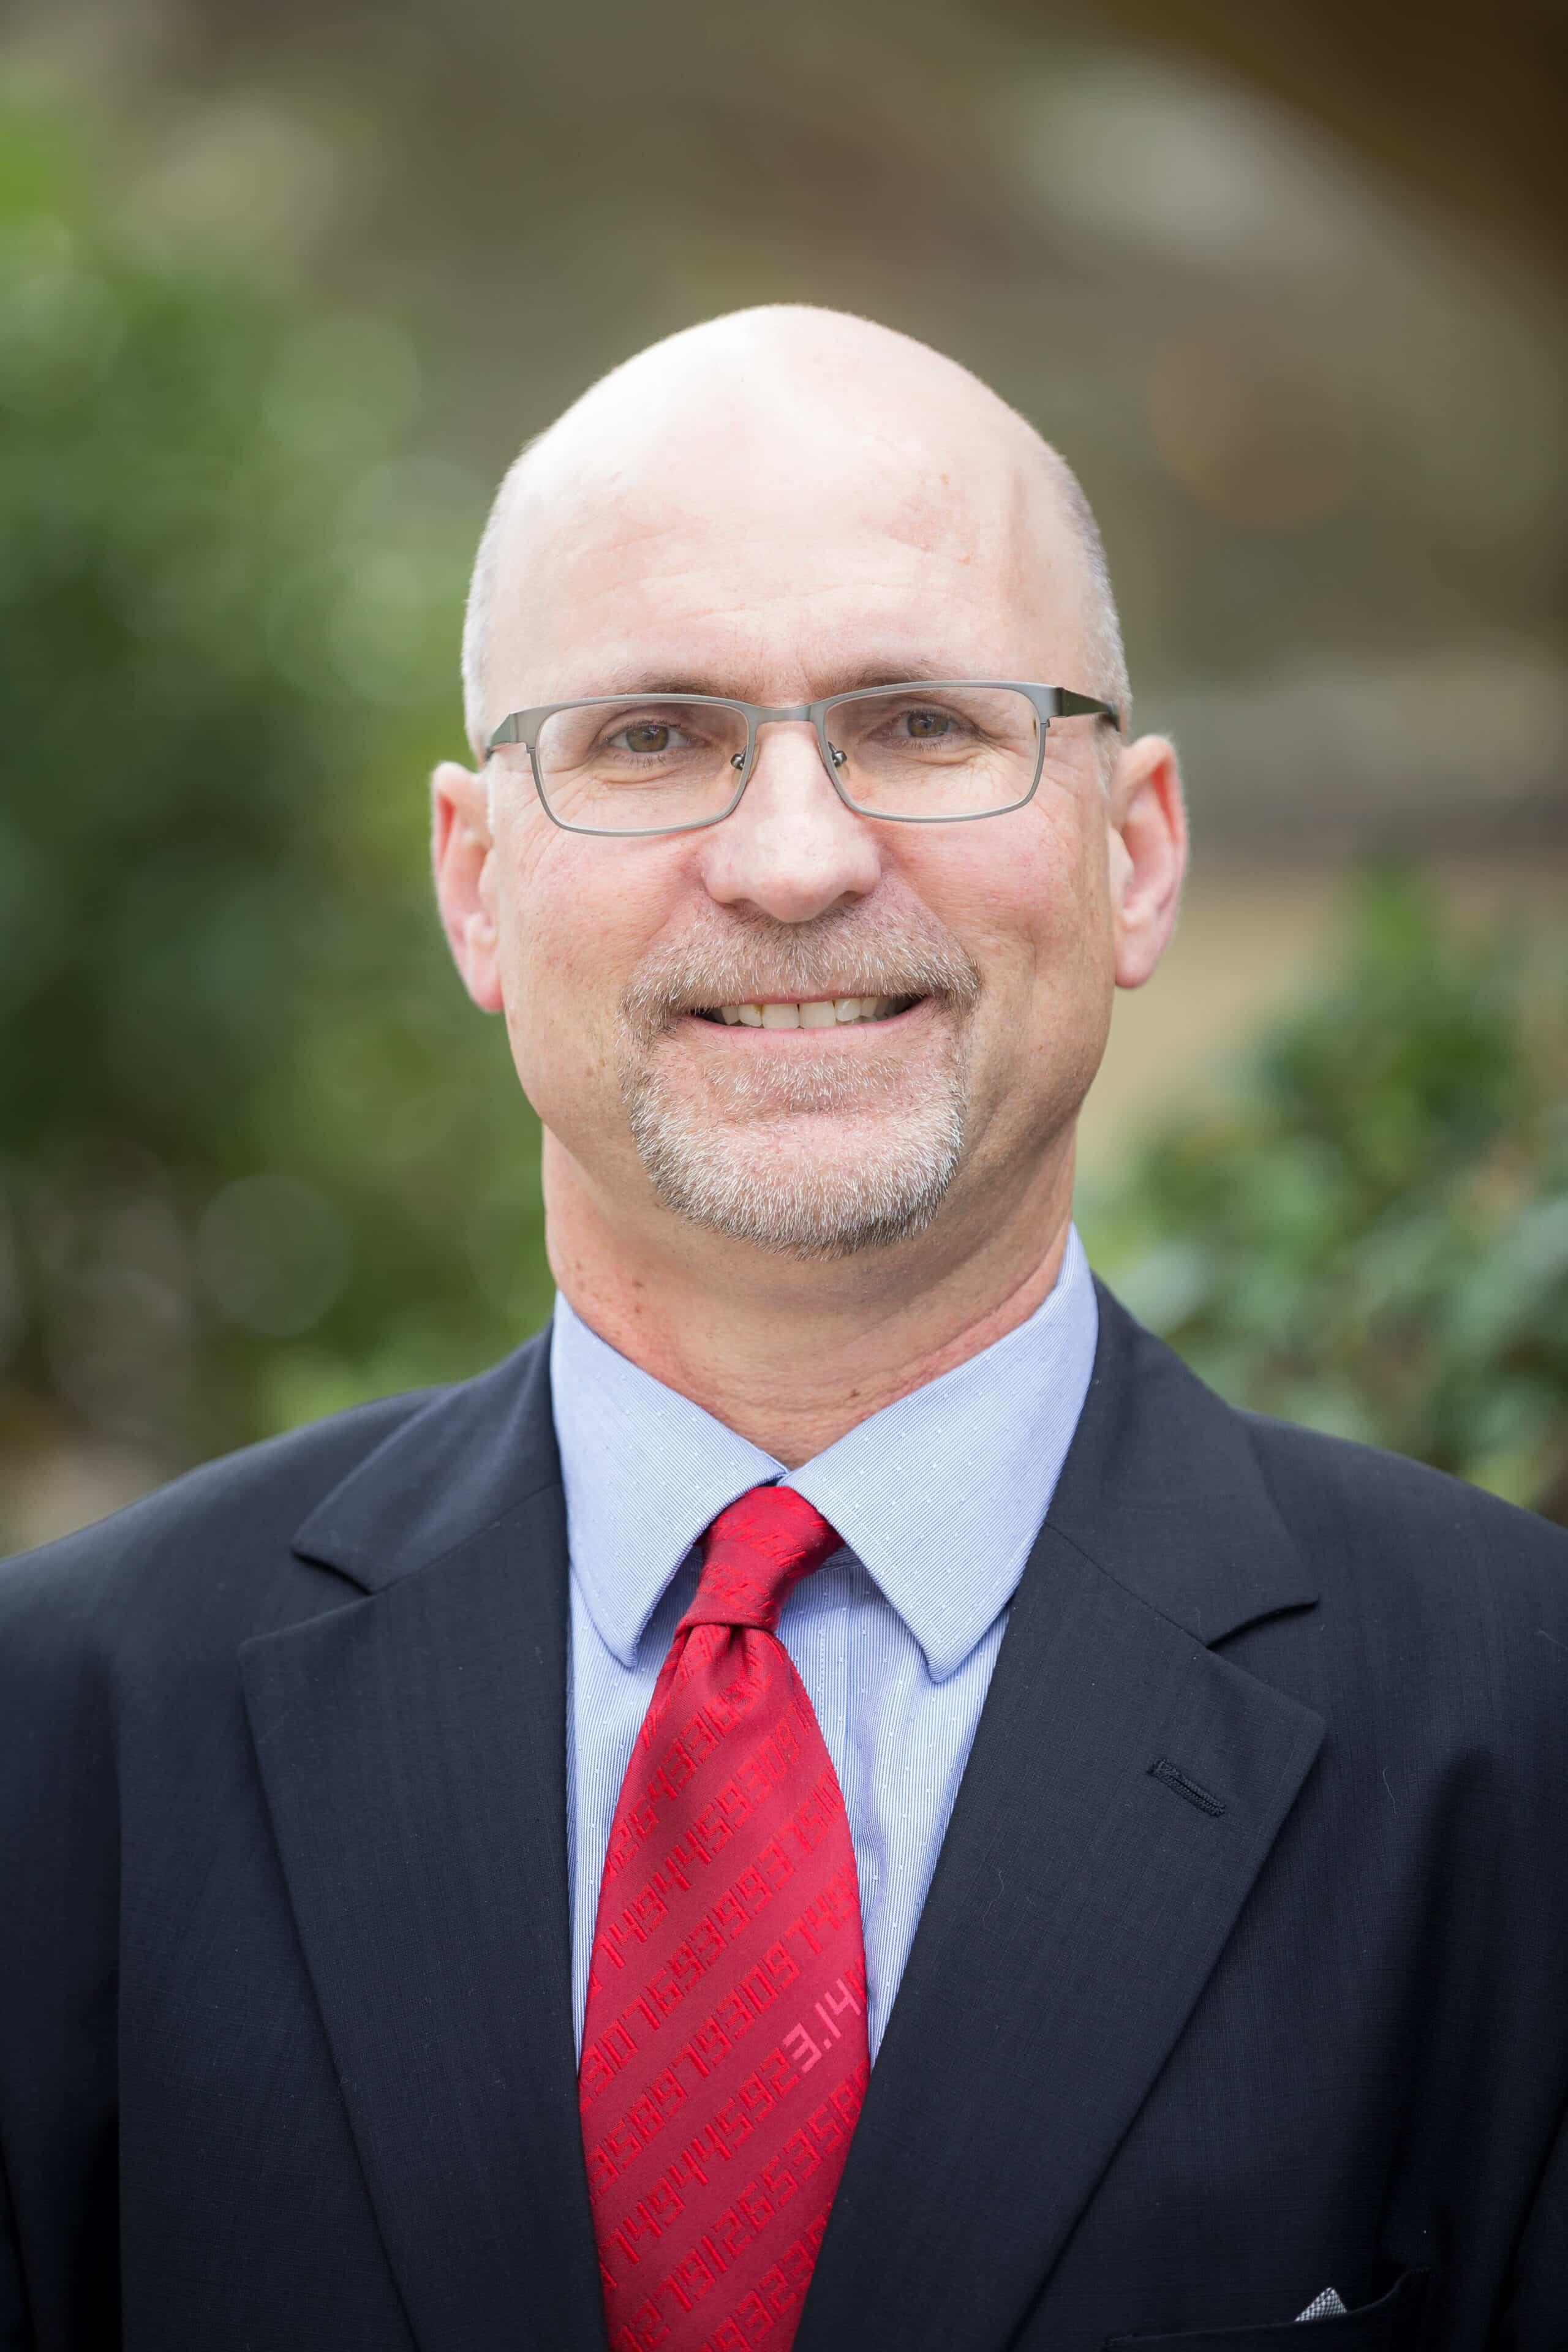 Marquis Huntsman, Castle Breckenridge - CFO